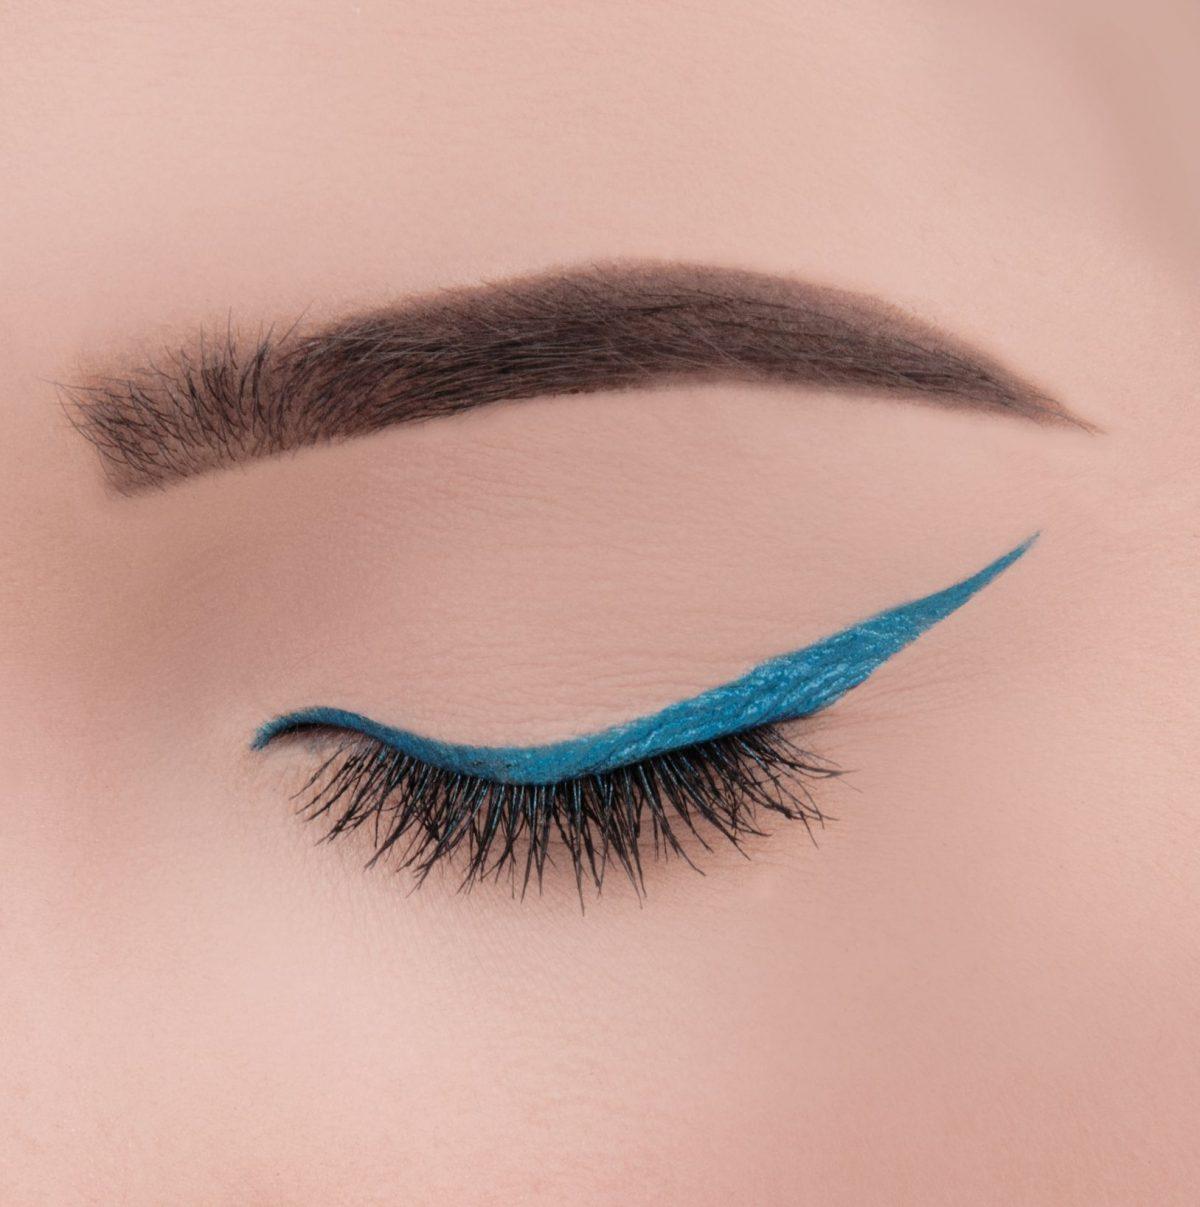 Jaki makijaż oka podbija kolor tęczówki? Krótki poradnik.